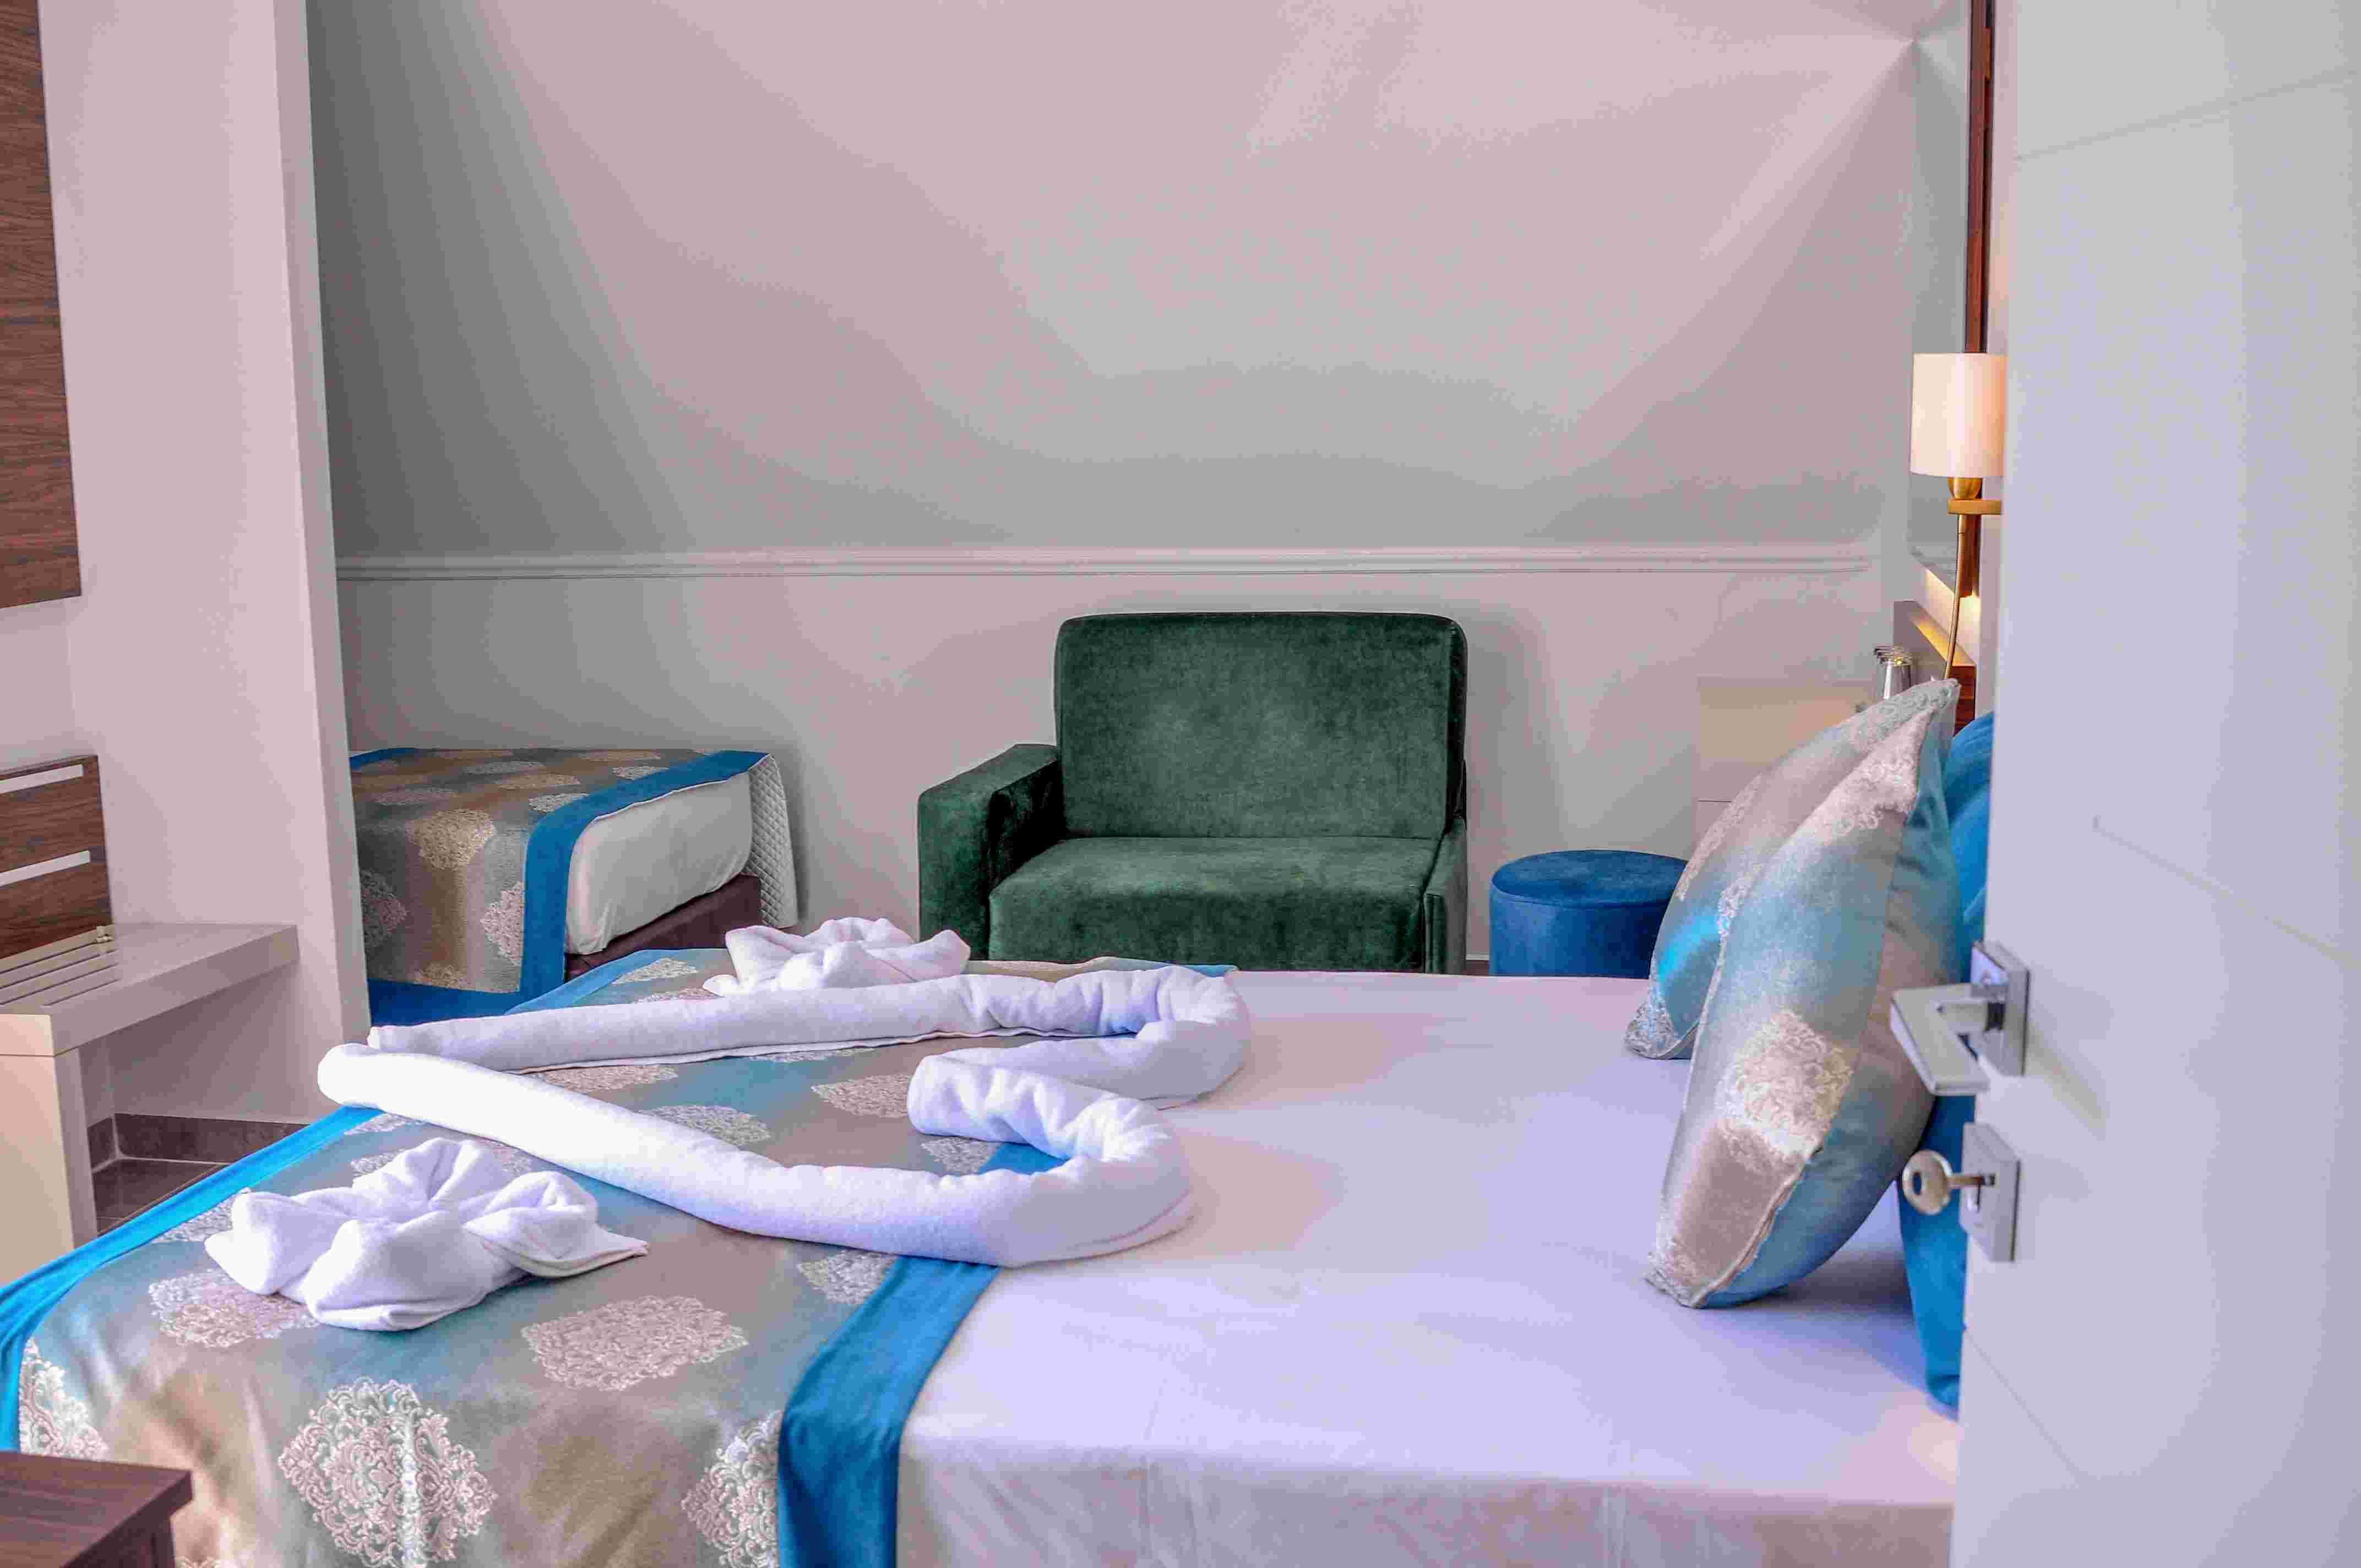 kleopatra-golden-beach-hotel-general-002